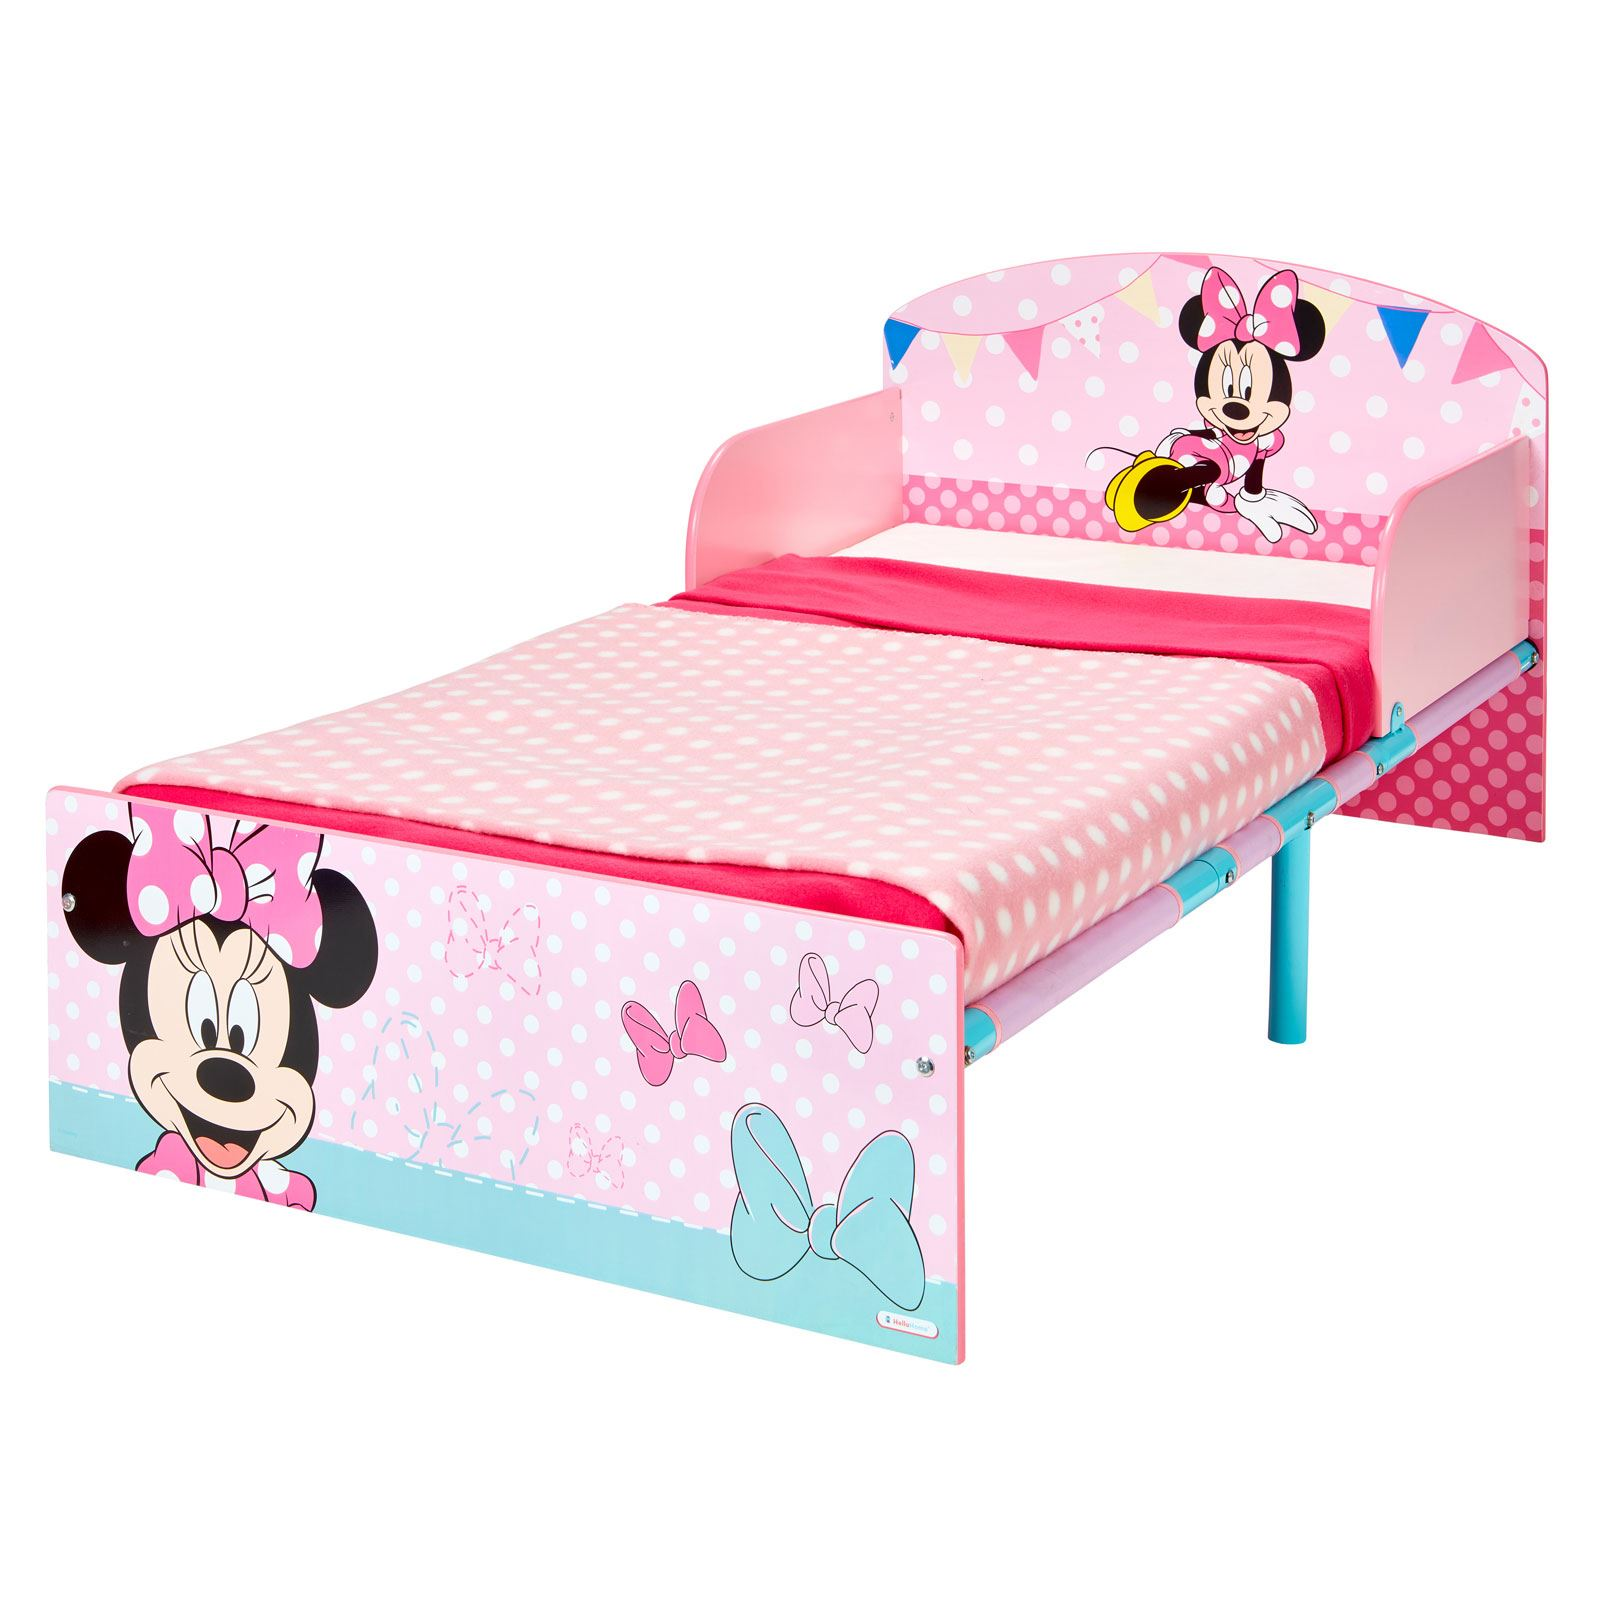 miniatura 25 - KIDS CHARACTER TODDLER BEDS - BOYS GIRLS BEDROOM DISNEY